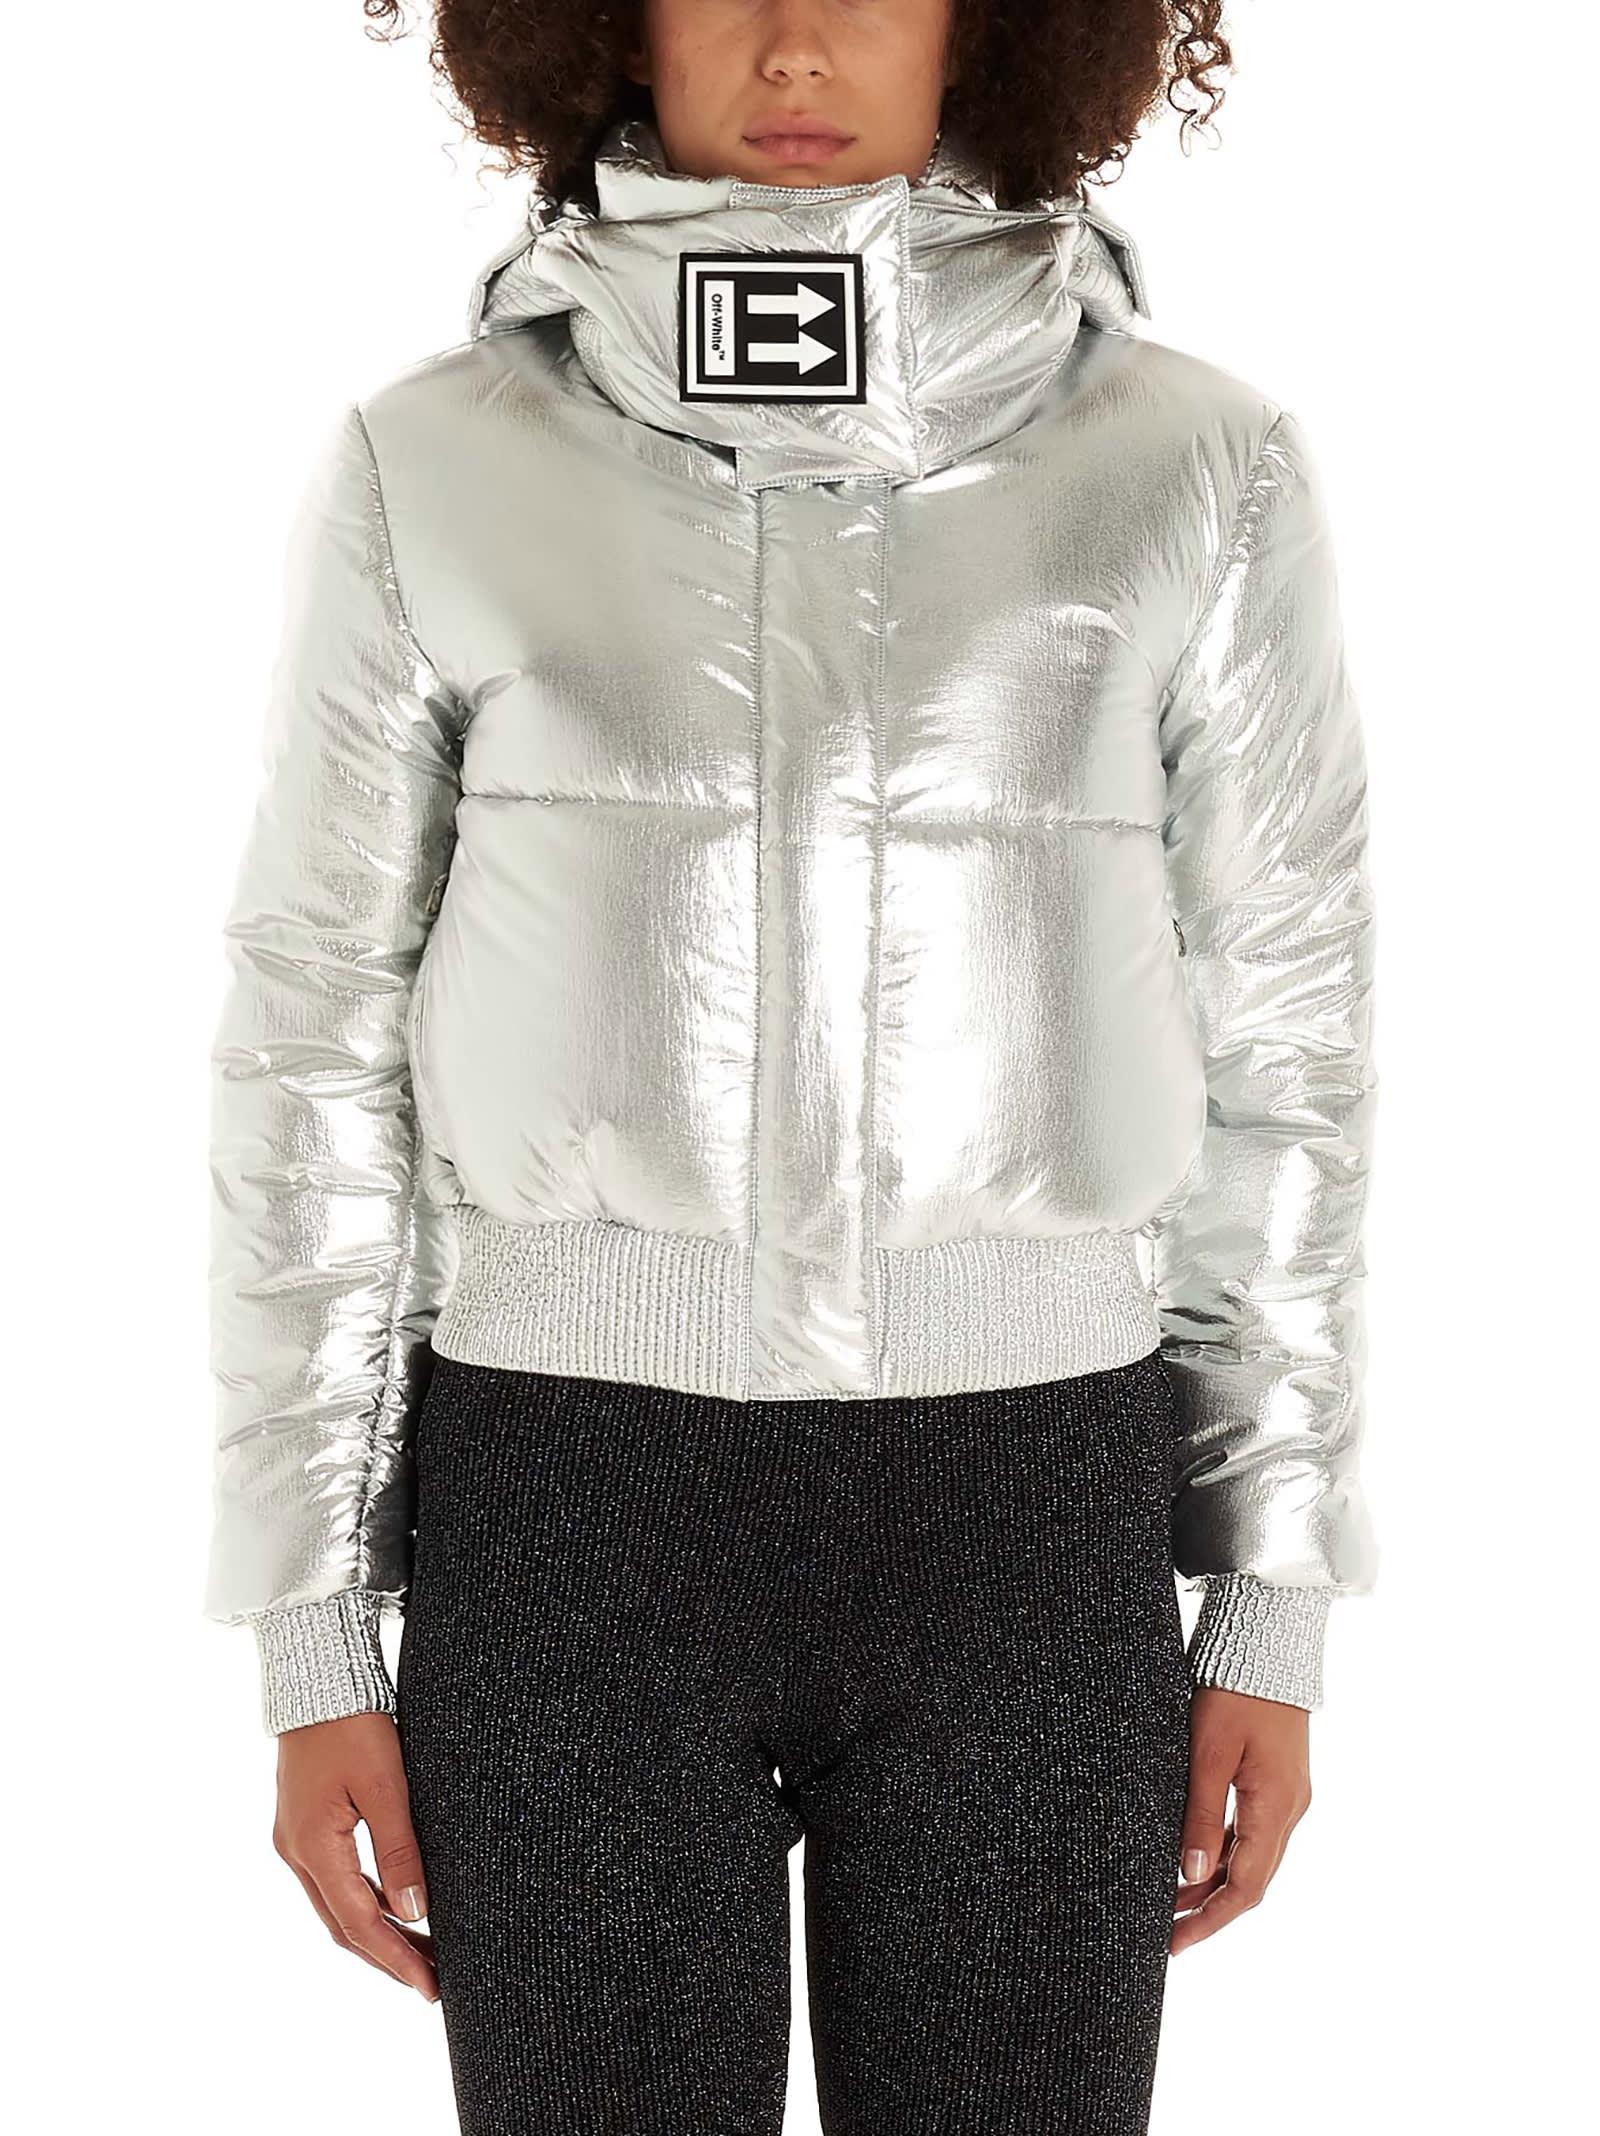 Off-white arrows Jacket